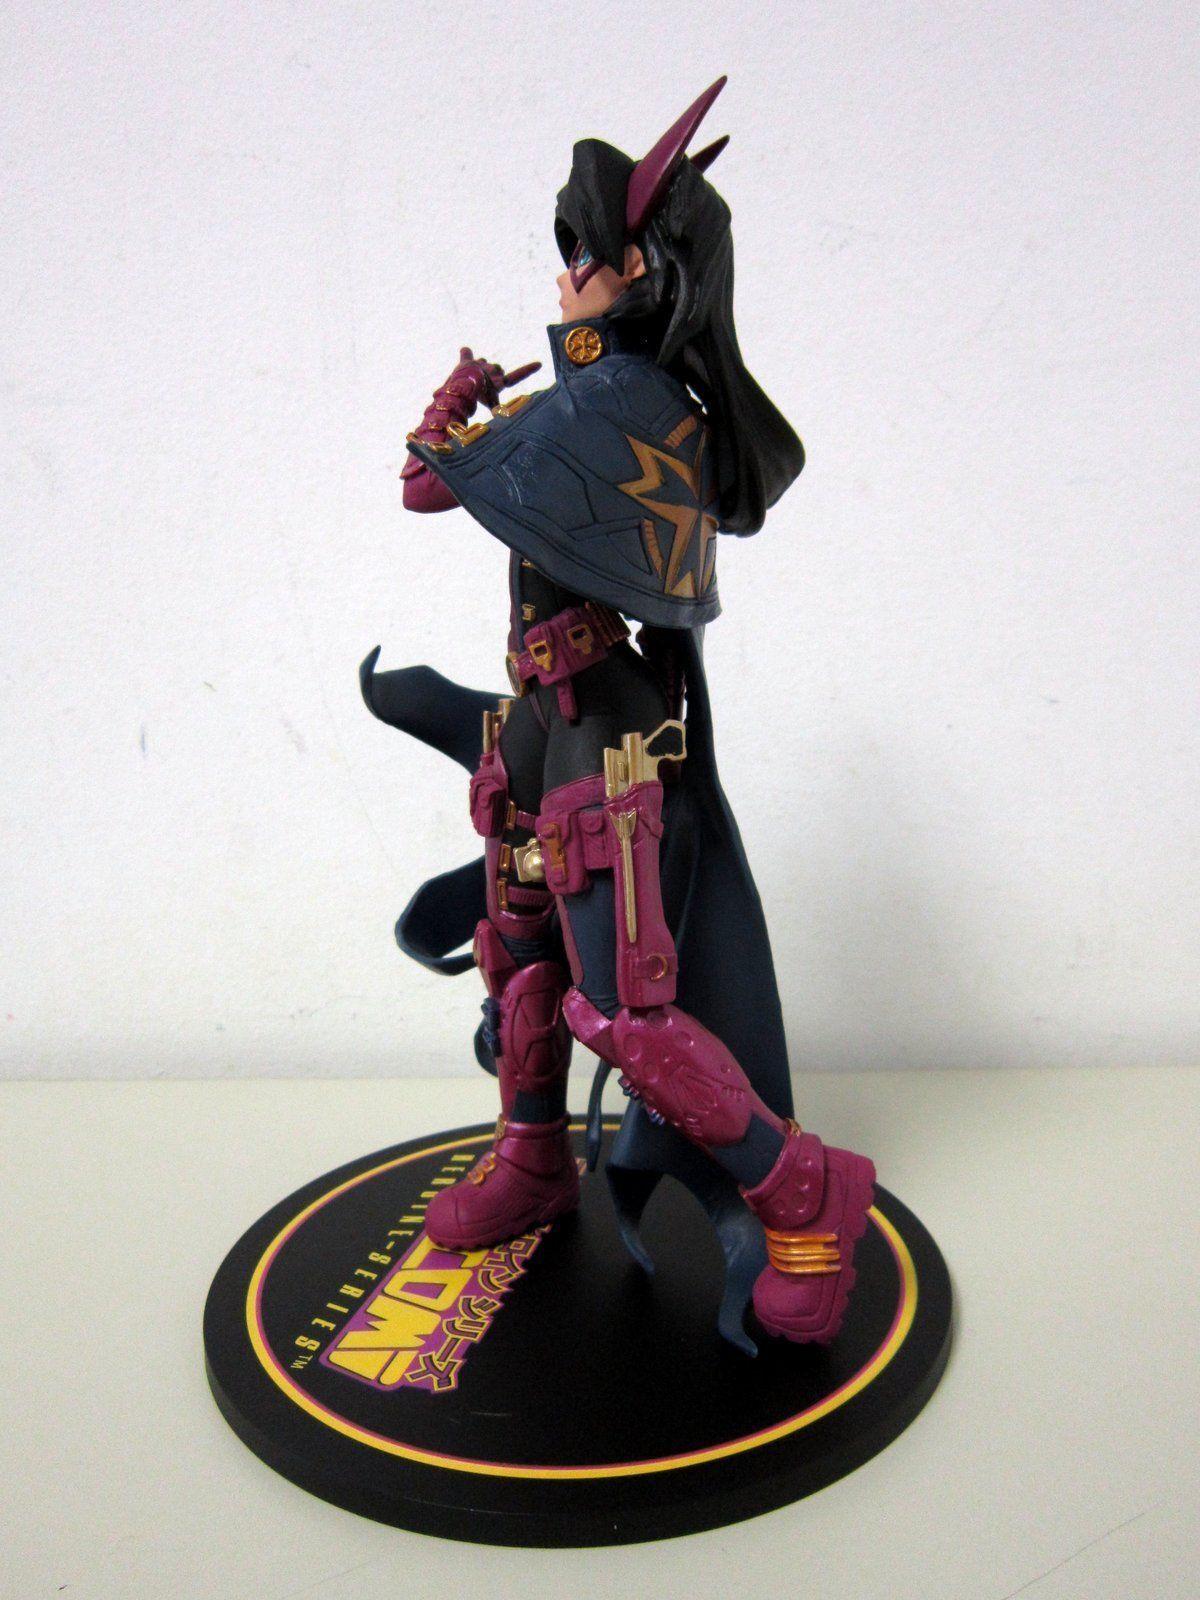 Ame-Comi ARTEMIS HUNTRESS Heroine-Series Limited Edition Figure Statue Statue Statue 9  PVC 285917